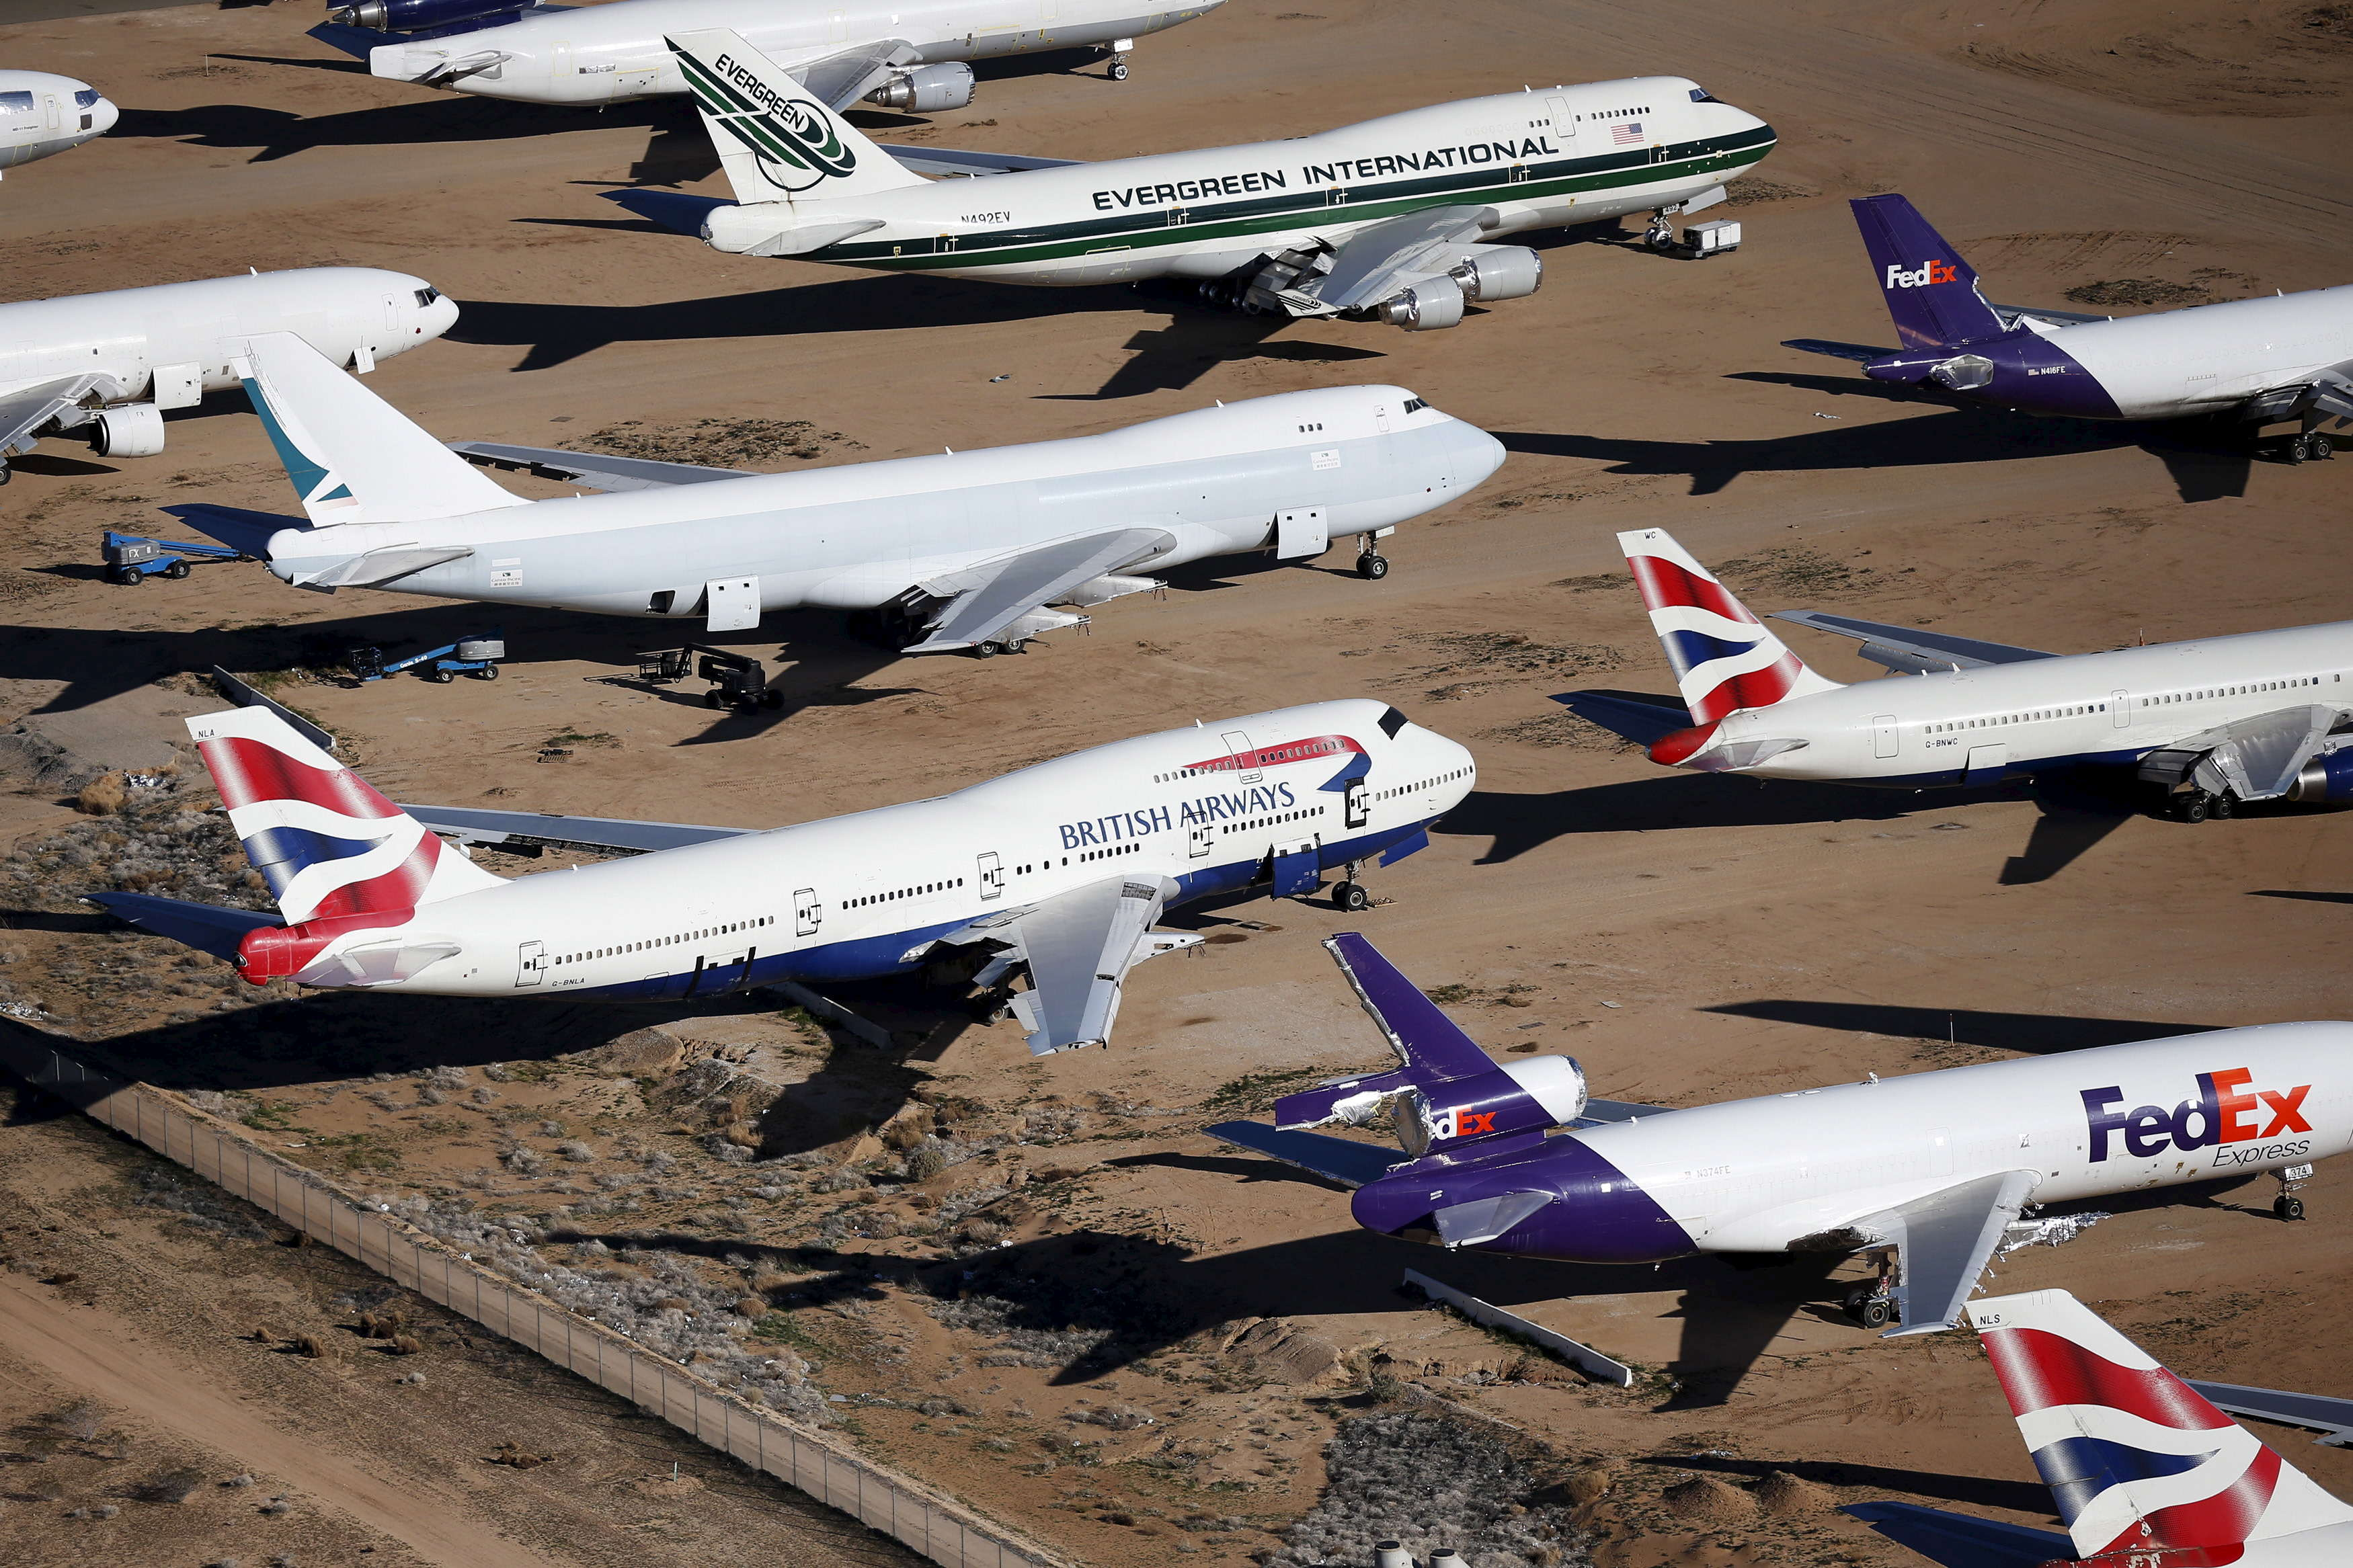 But as the average age of their 747 fleet near 20 years, British Airways is slowly retiring its older birds.